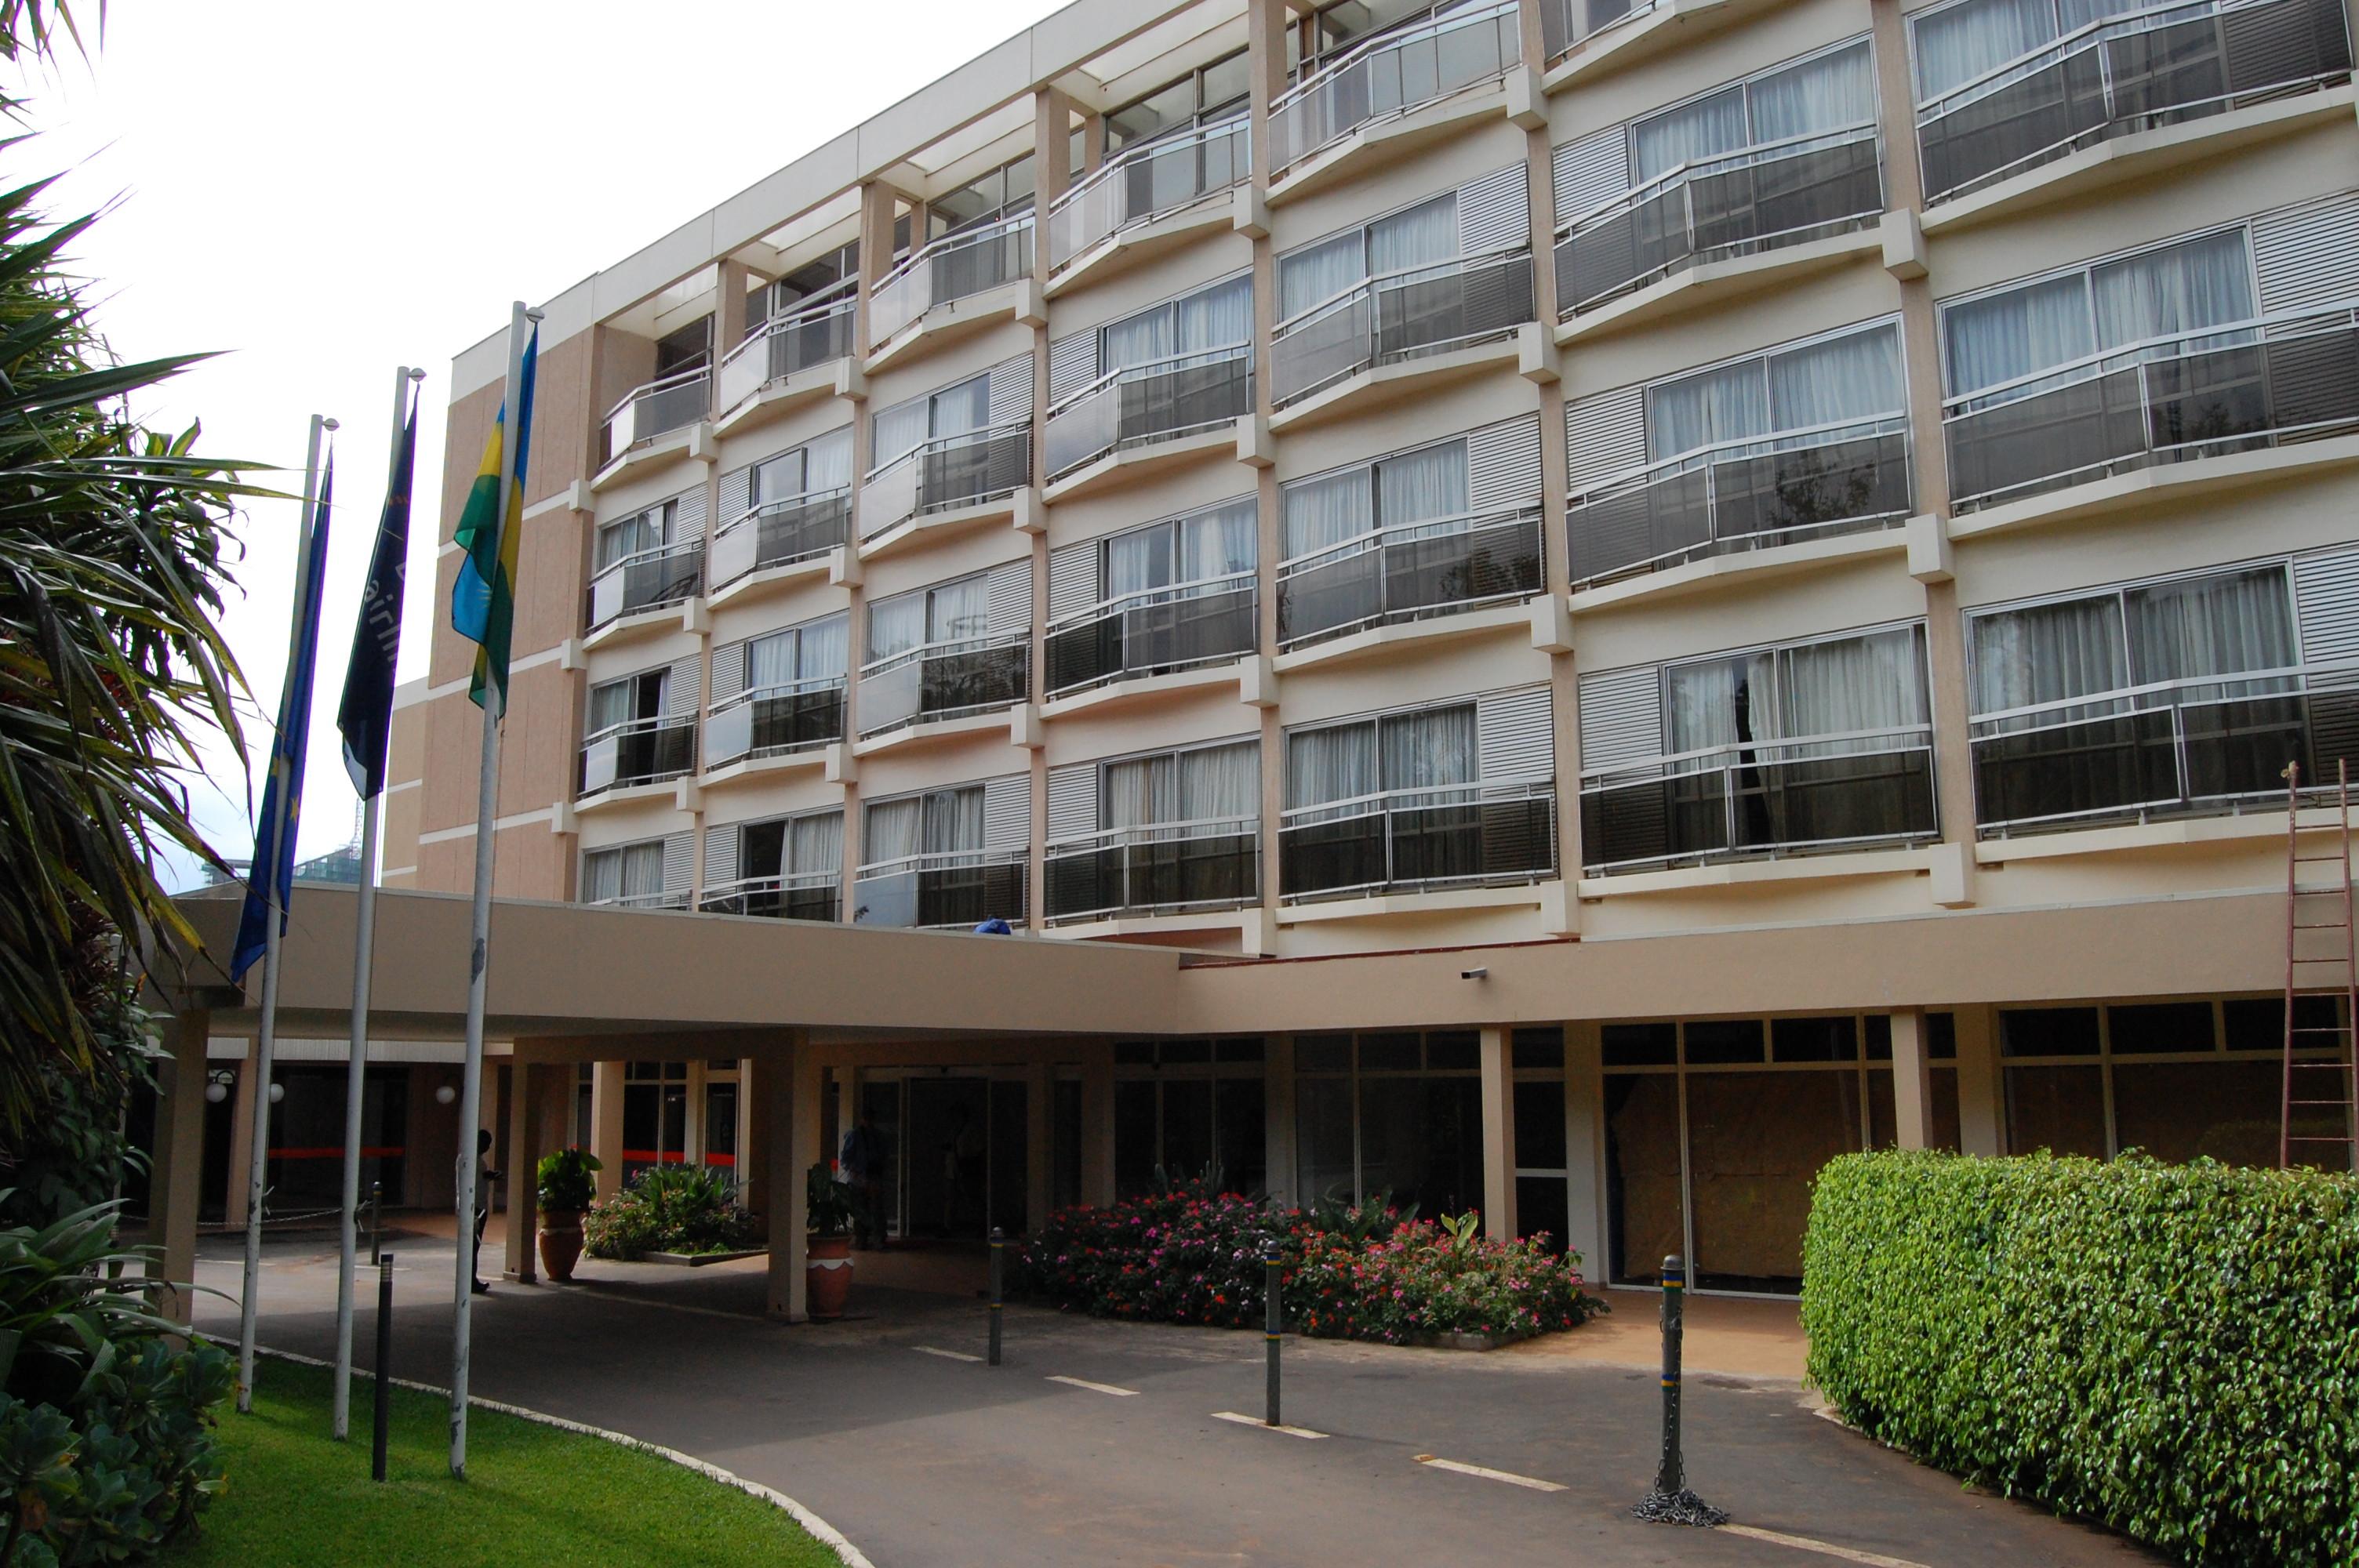 juvenile criminals essay chrome resume after close cheap scholarship leadership essays hotel rwanda review essay